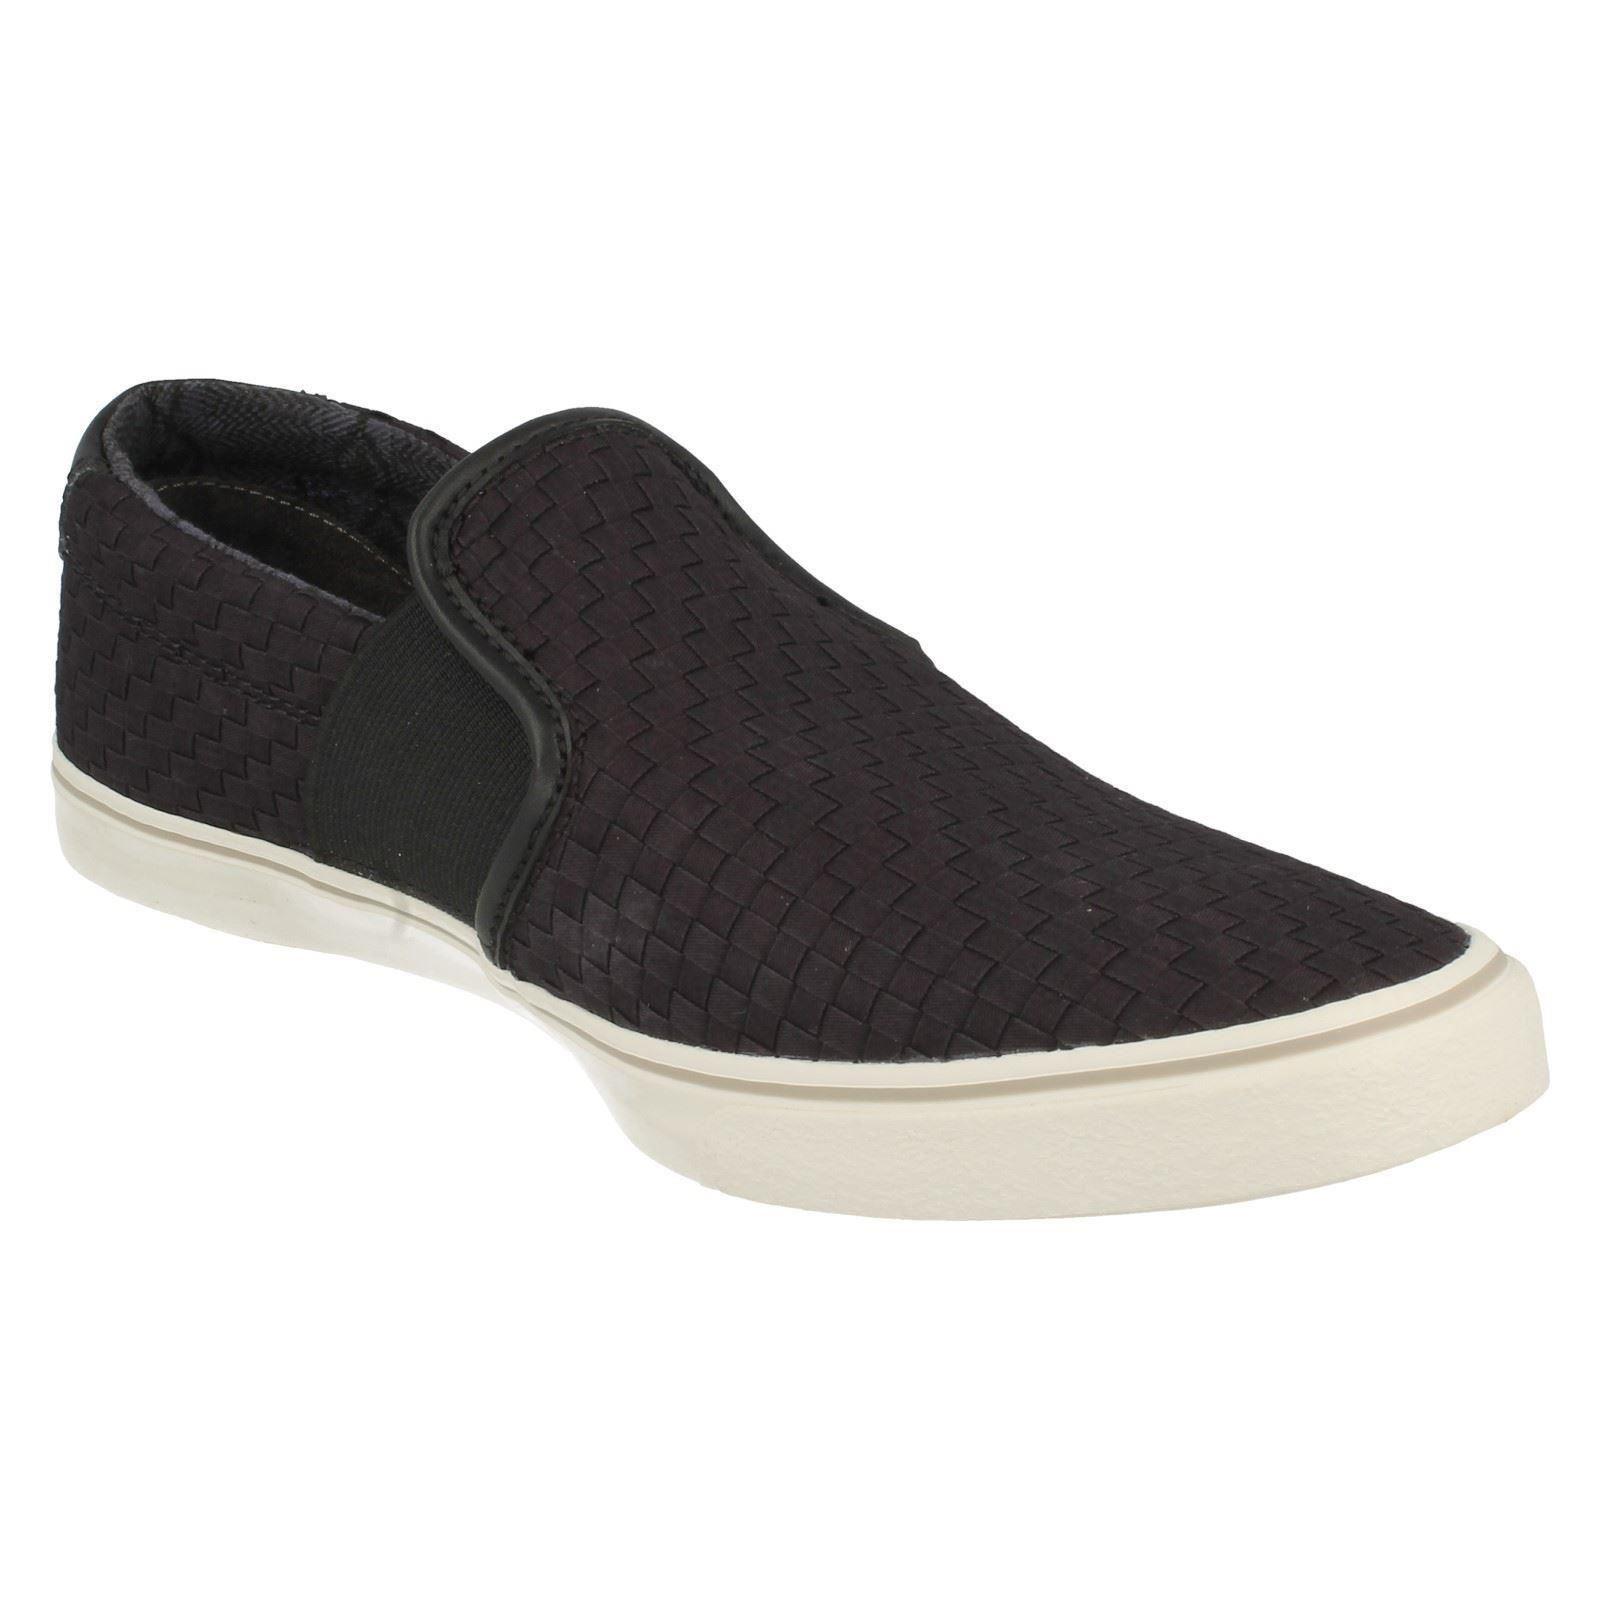 Men's Clarks Slip On  Casual Shoes Label -  On Gosling Step 772f35